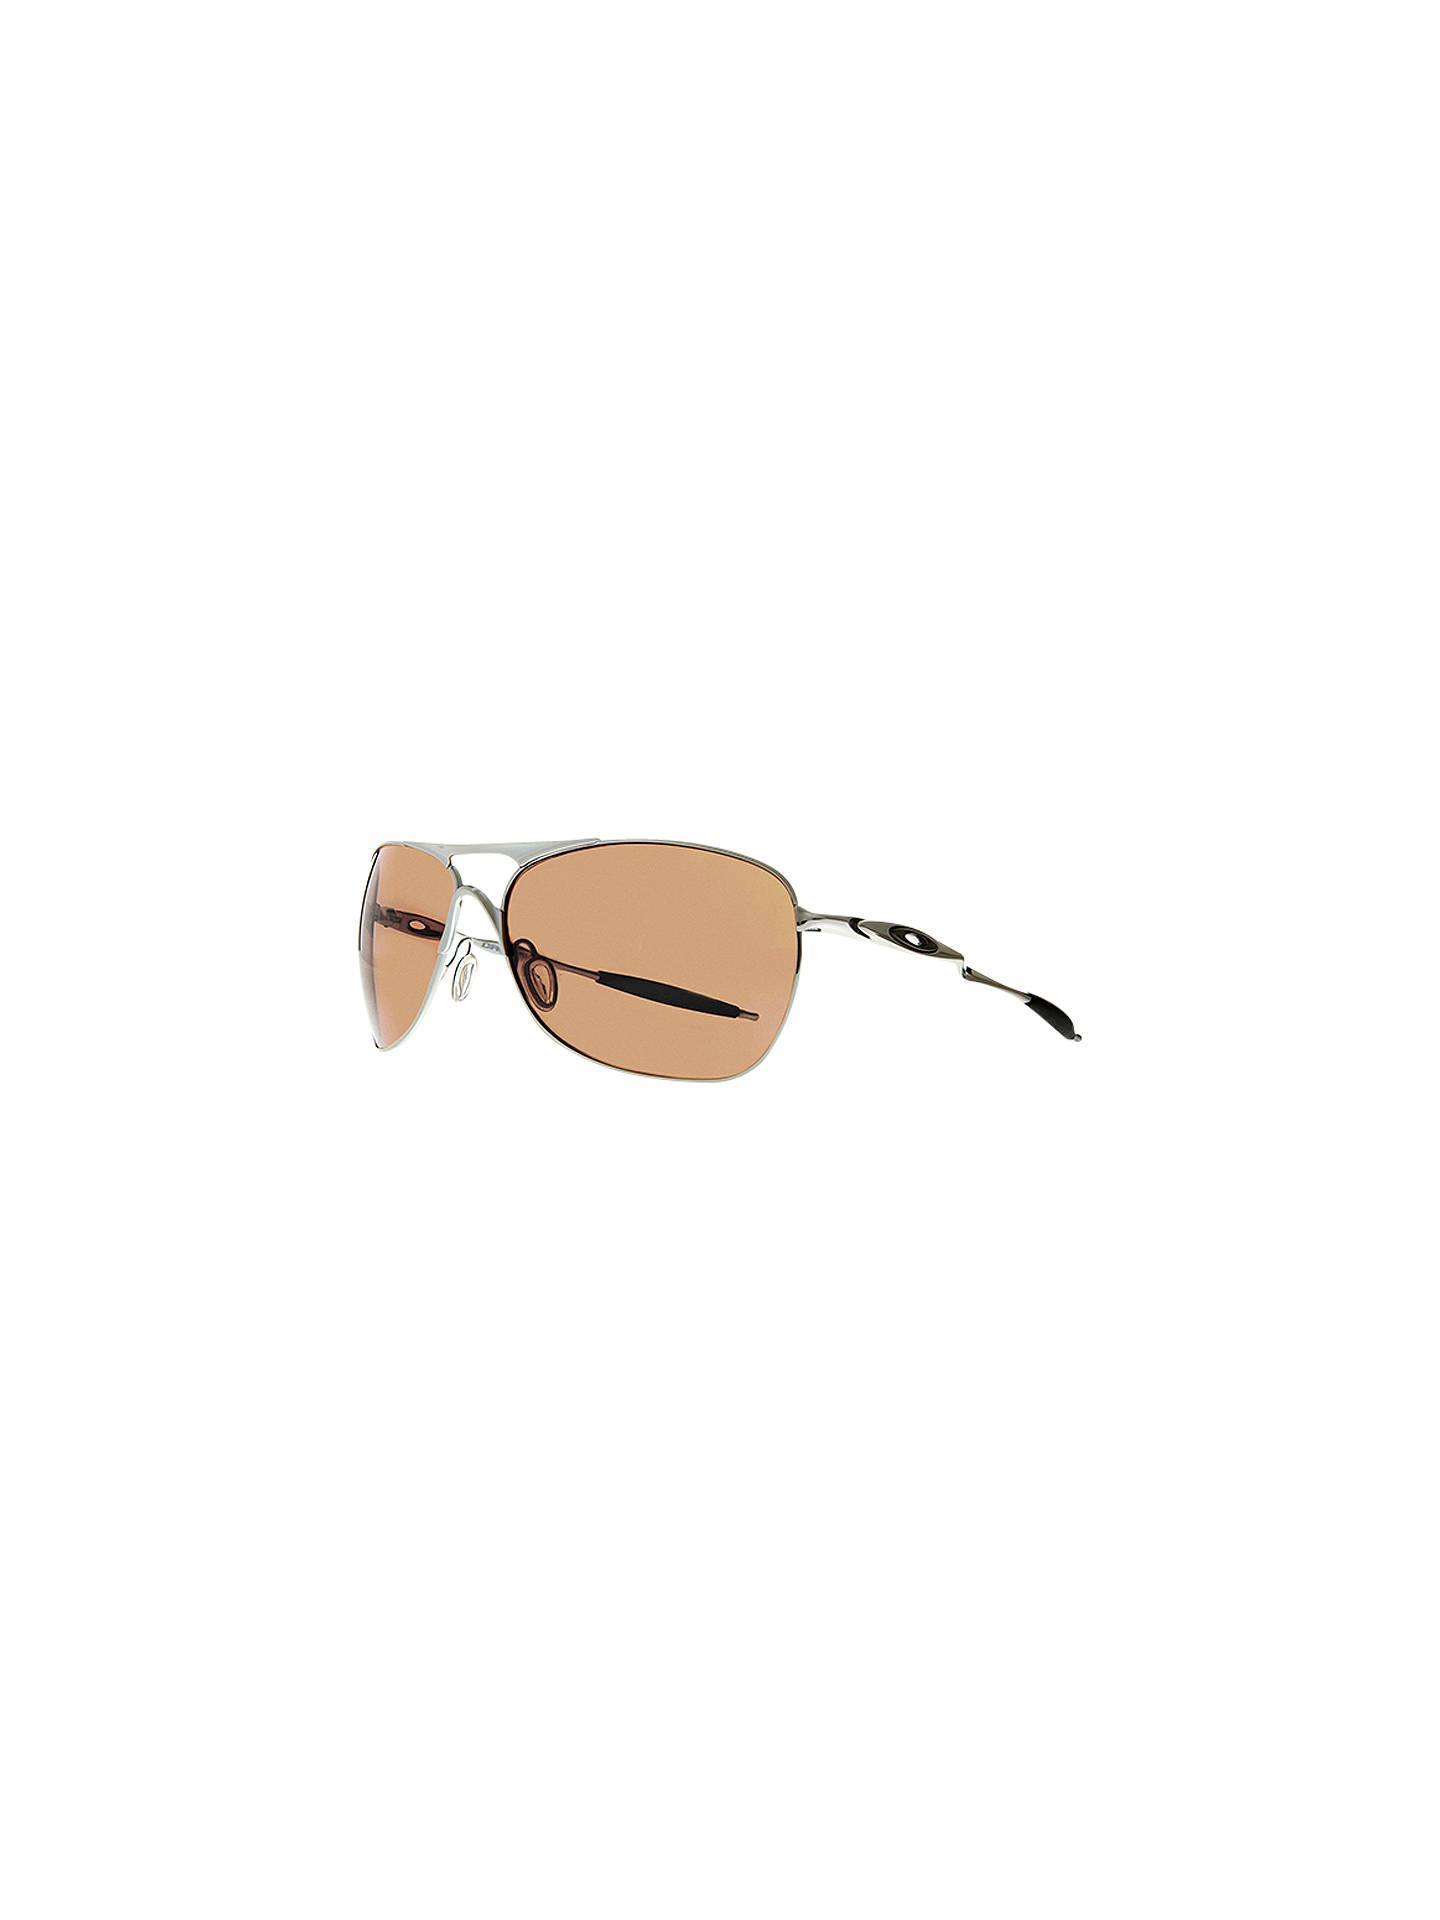 f33cba7e78 Oakley OO4060 Cross Hair Square Sunglasses at John Lewis   Partners